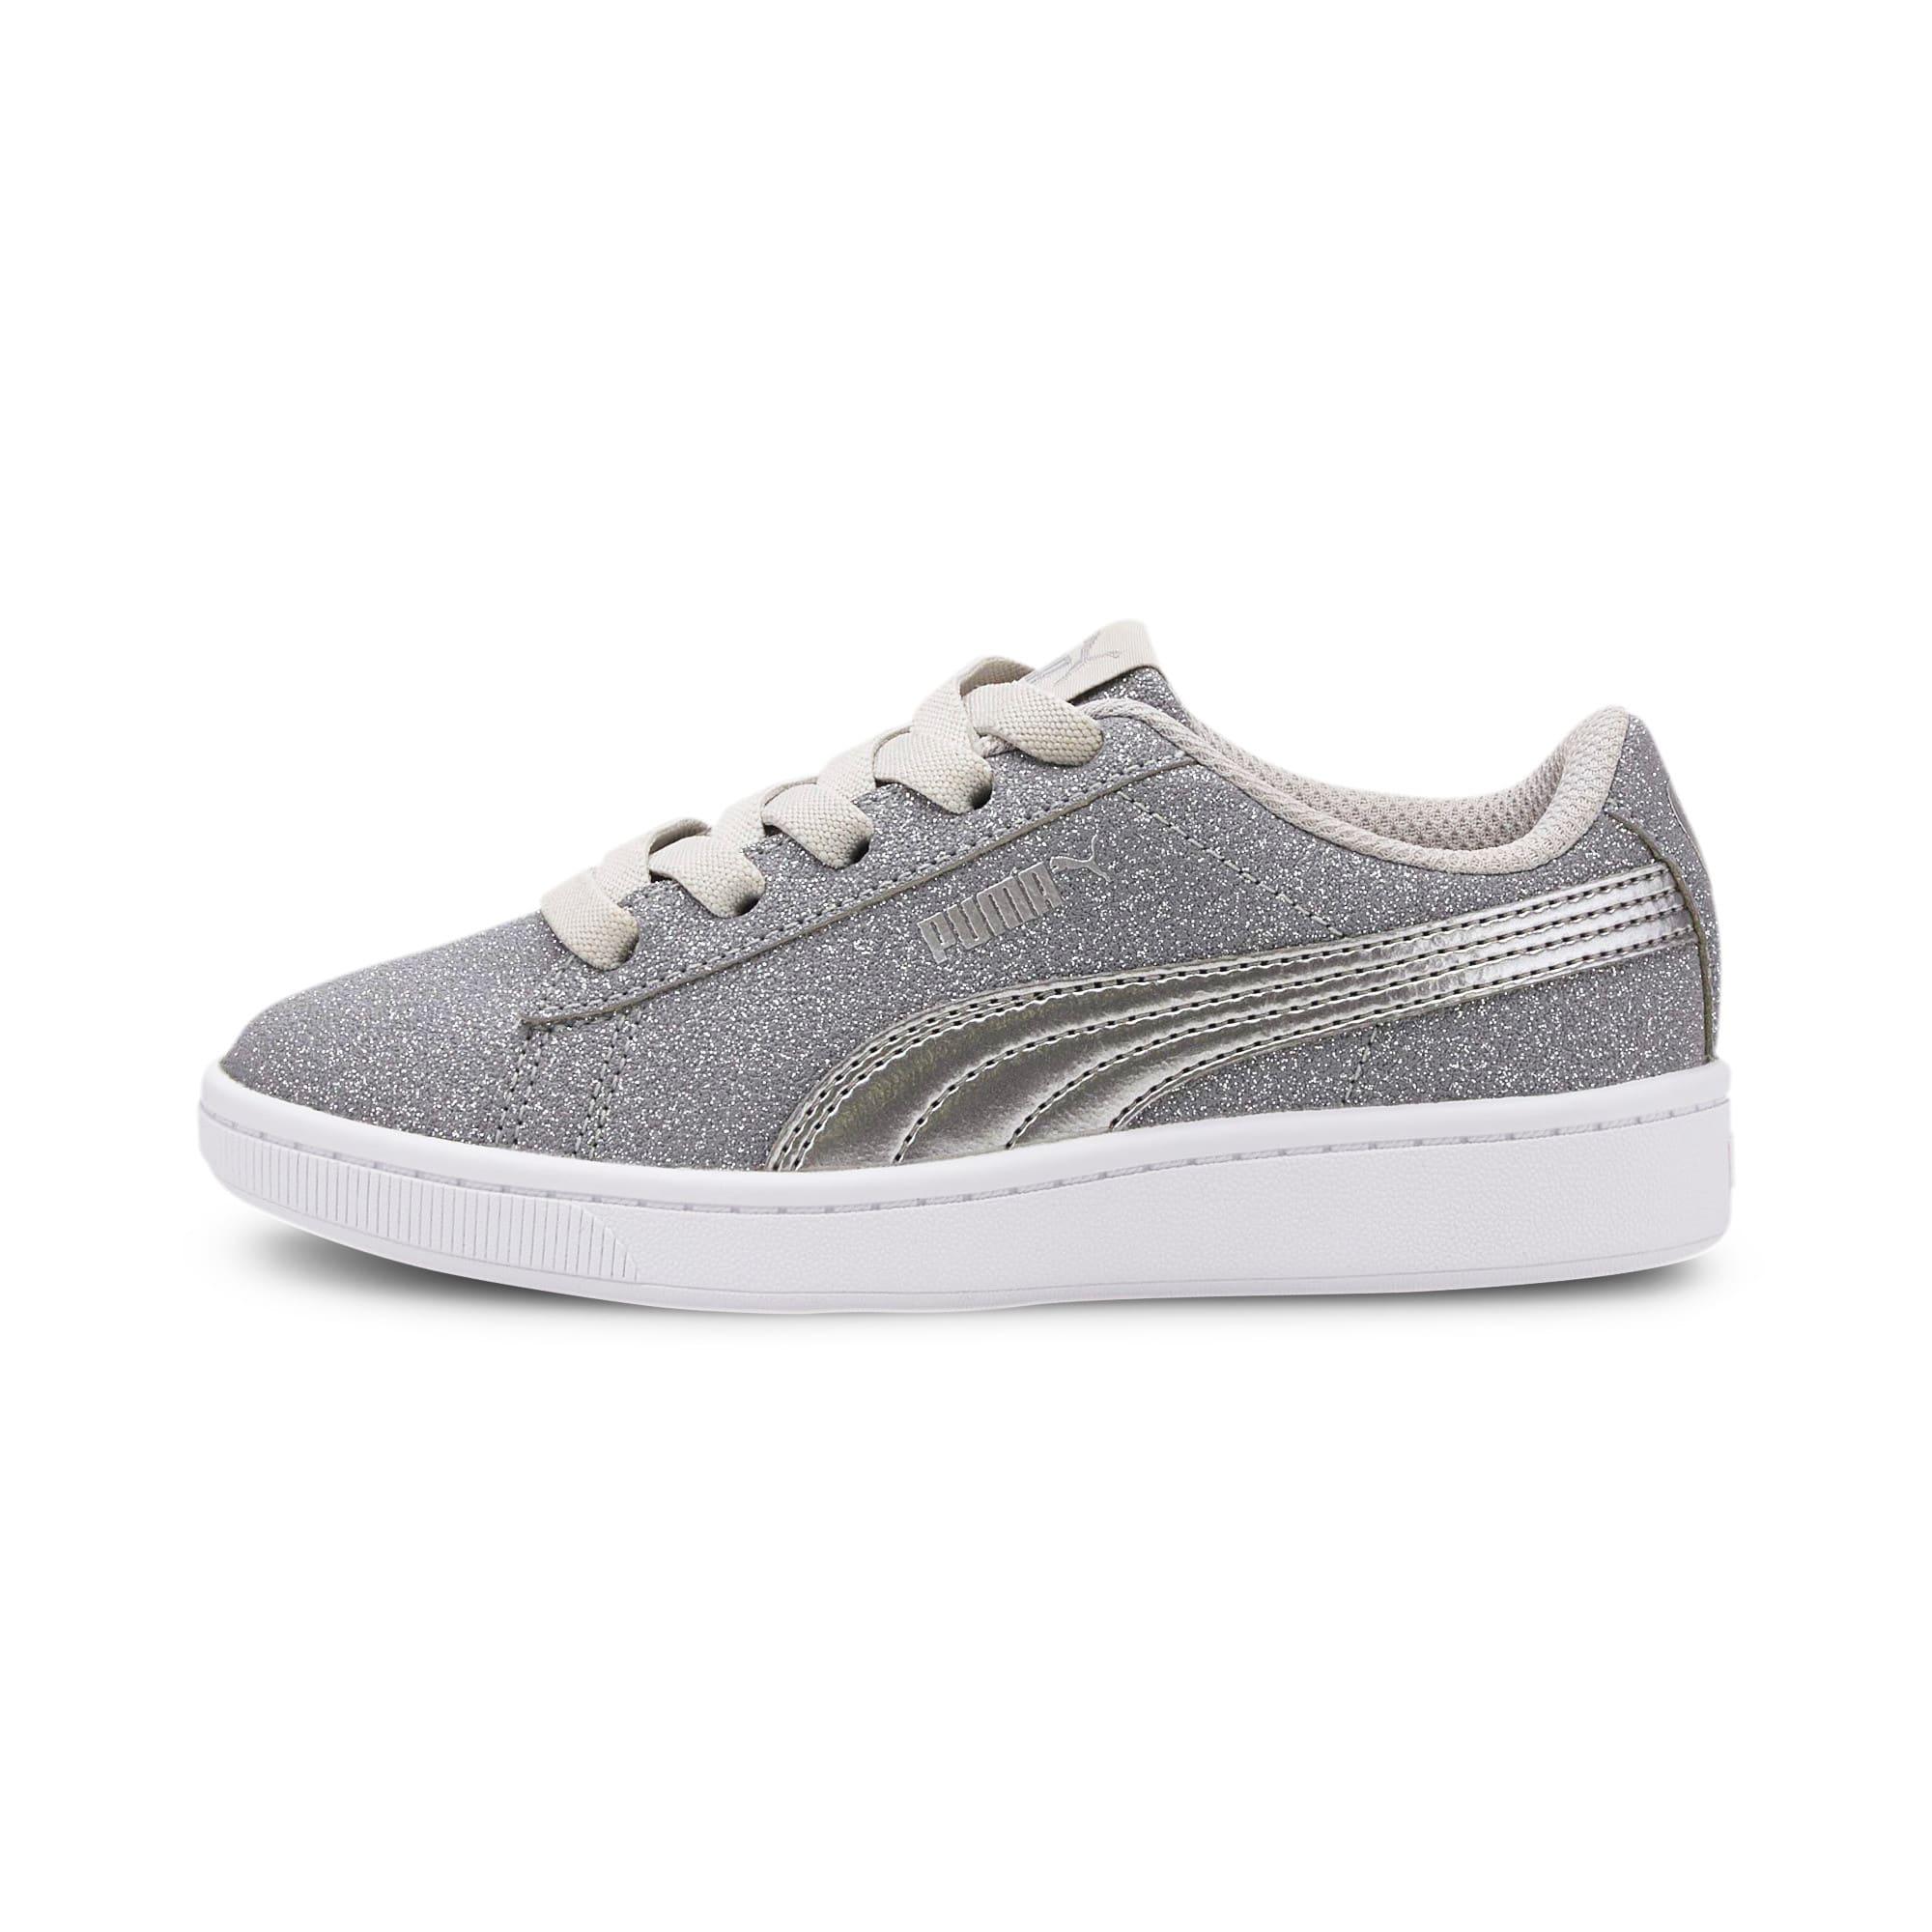 Thumbnail 1 of PUMA Vikky v2 Glitz AC Sneakers PS, Gray Violet-Silver-White, medium